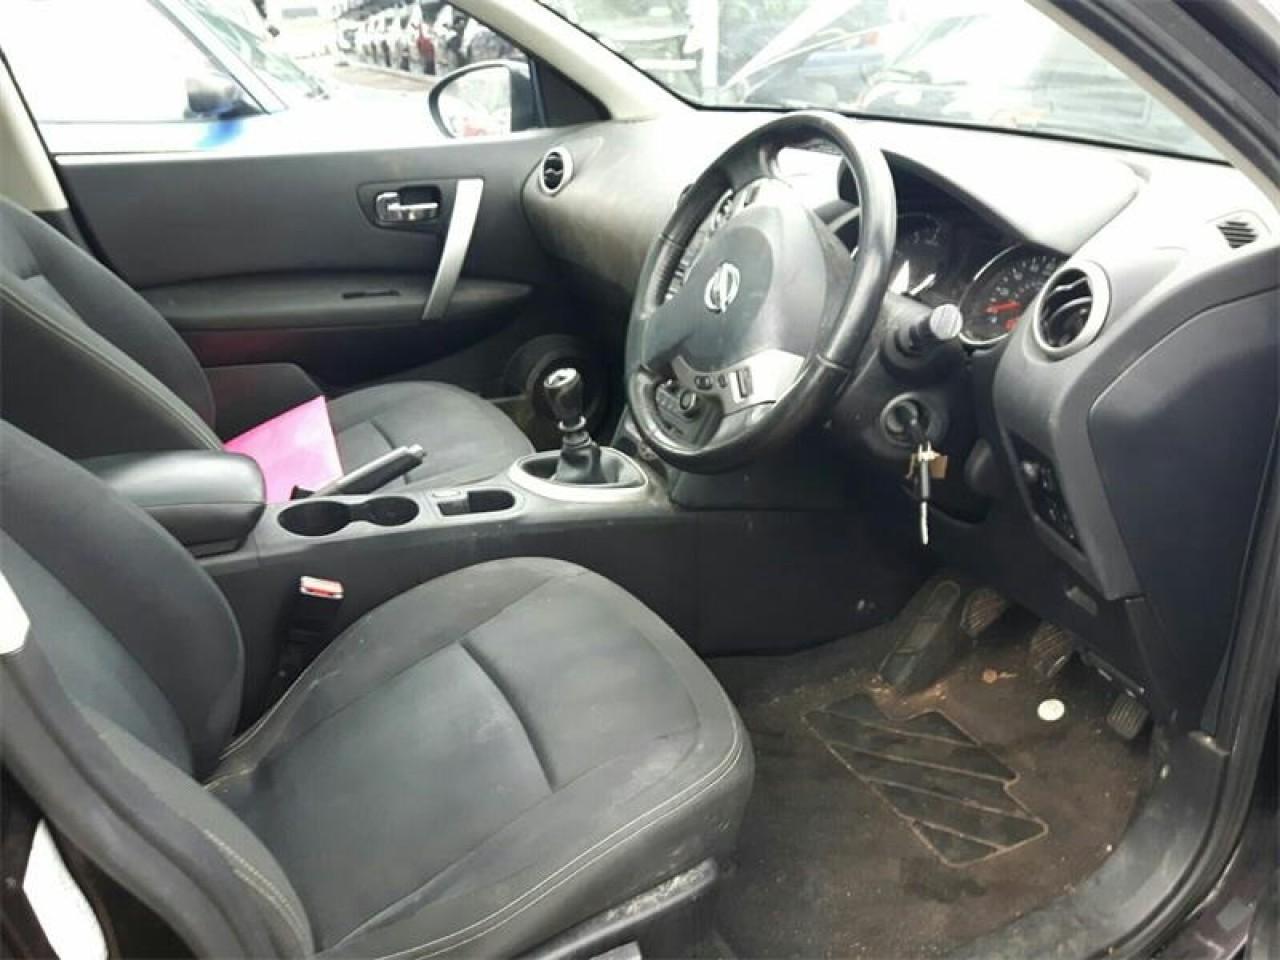 Pompa servodirectie Nissan Qashqai 2010 SUV 1.5 dCi